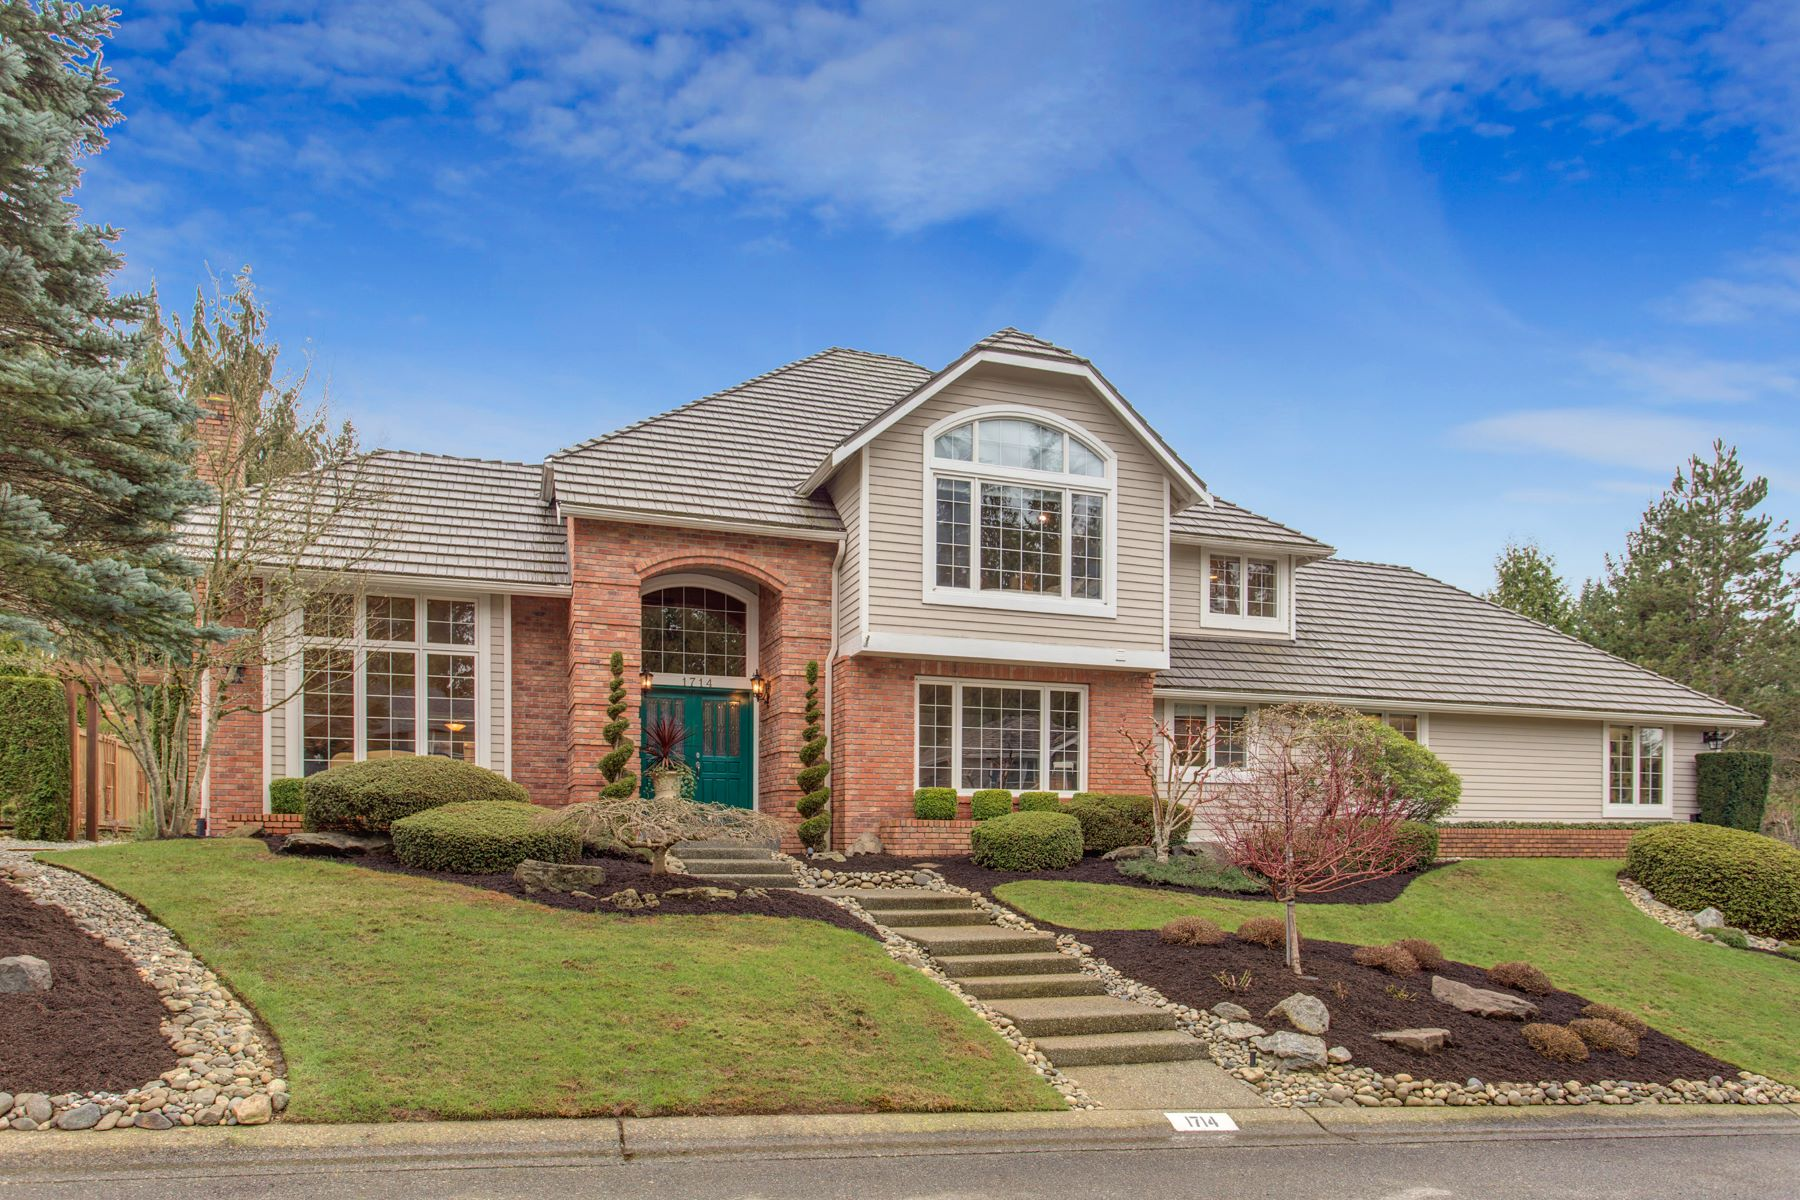 Single Family Homes por un Venta en 1714 148th St SE, Mill Creek, WA 98012 1714 148th St SE Mill Creek, Washington 98012 Estados Unidos